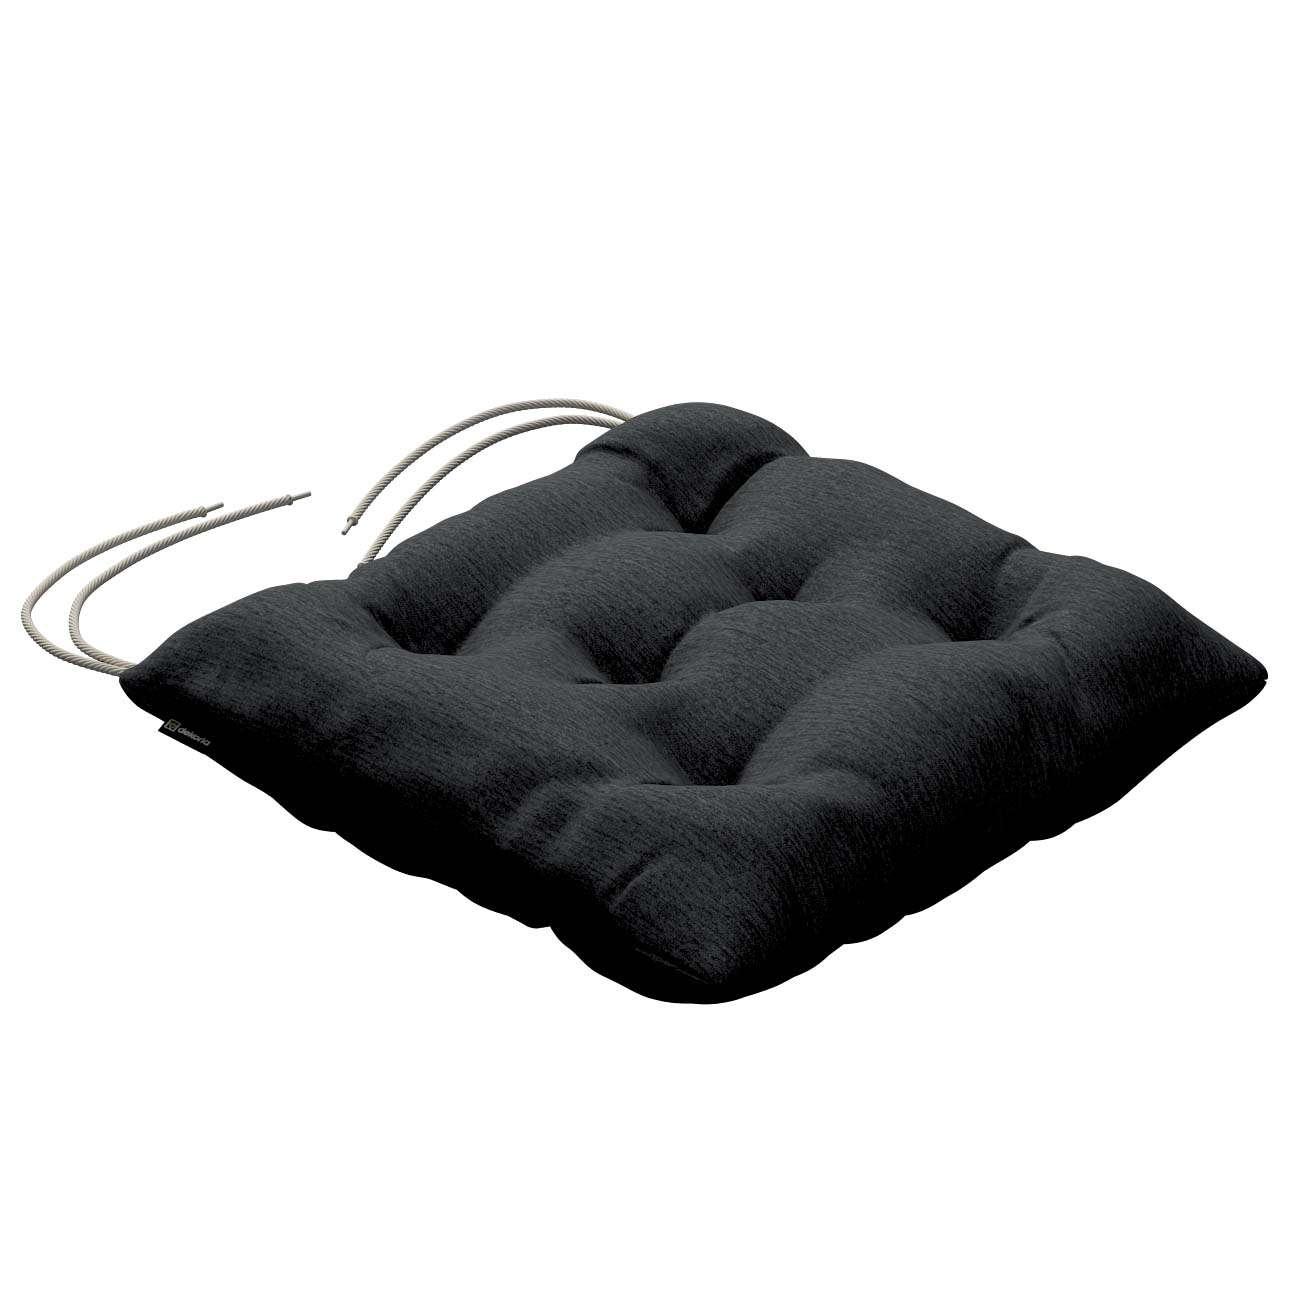 Kėdės pagalvėlė Jacek  40 x 40 x 8 cm kolekcijoje Chenille, audinys: 702-20